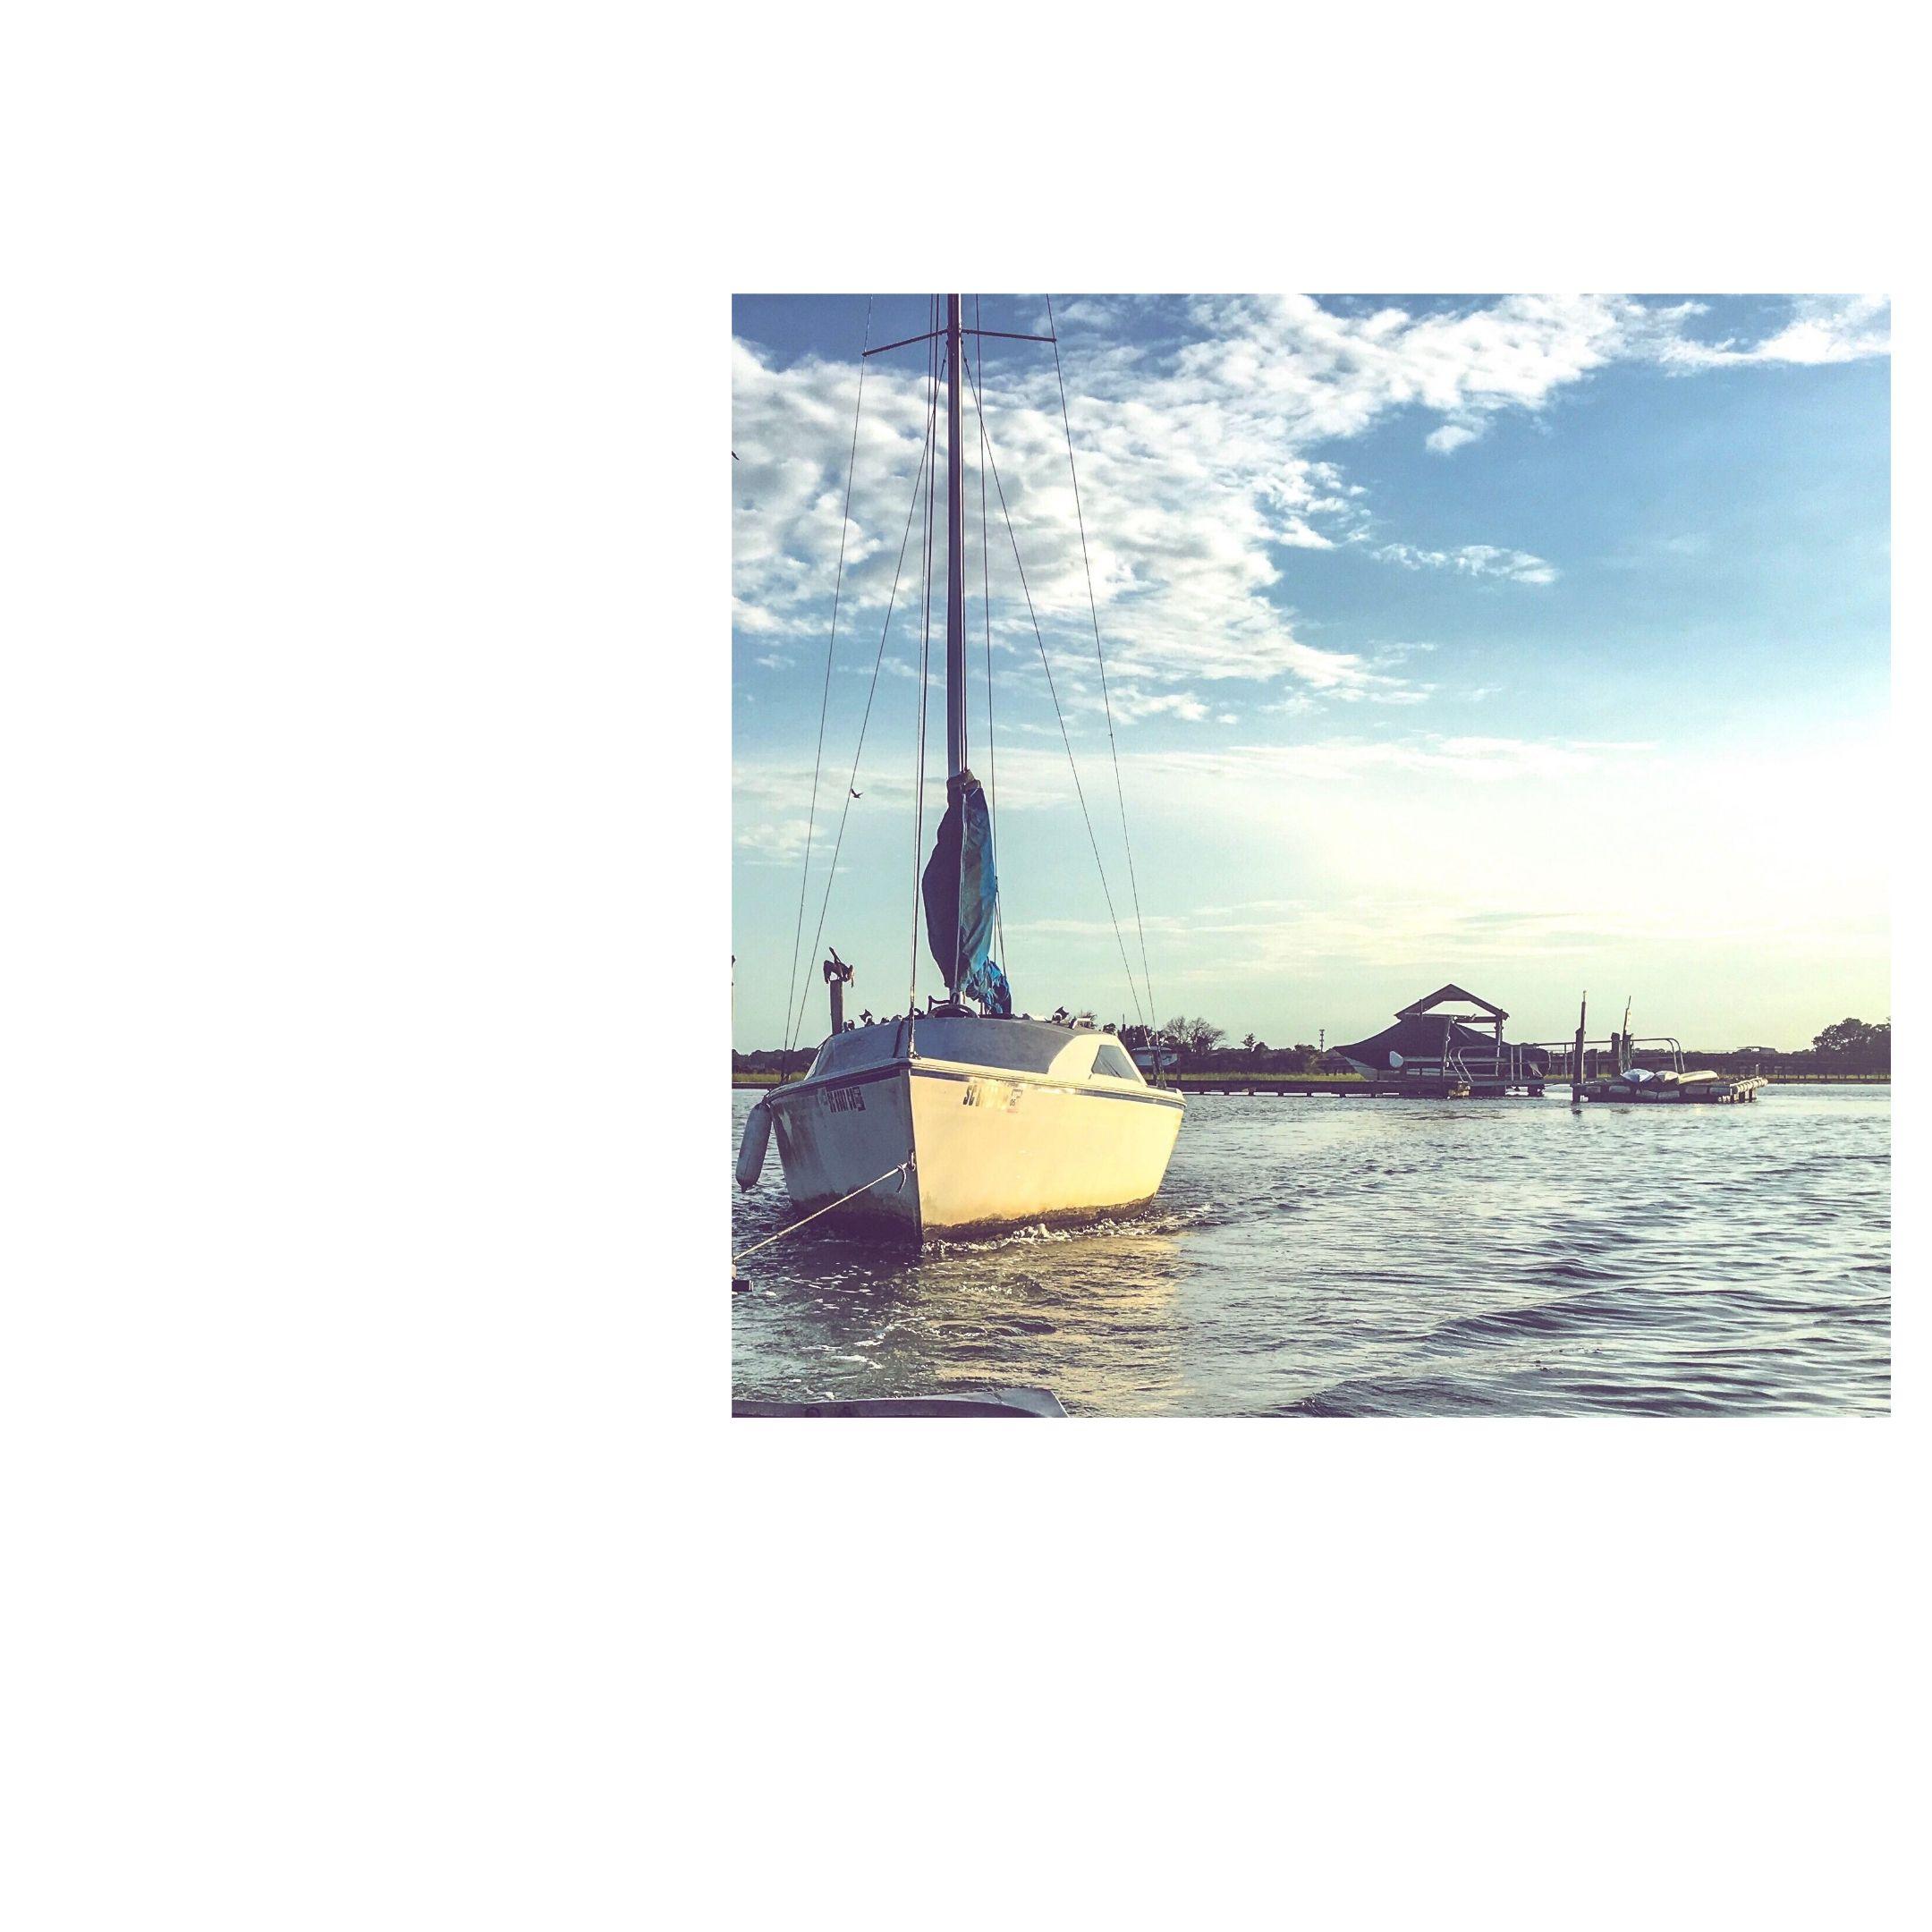 sailboat theft in progress